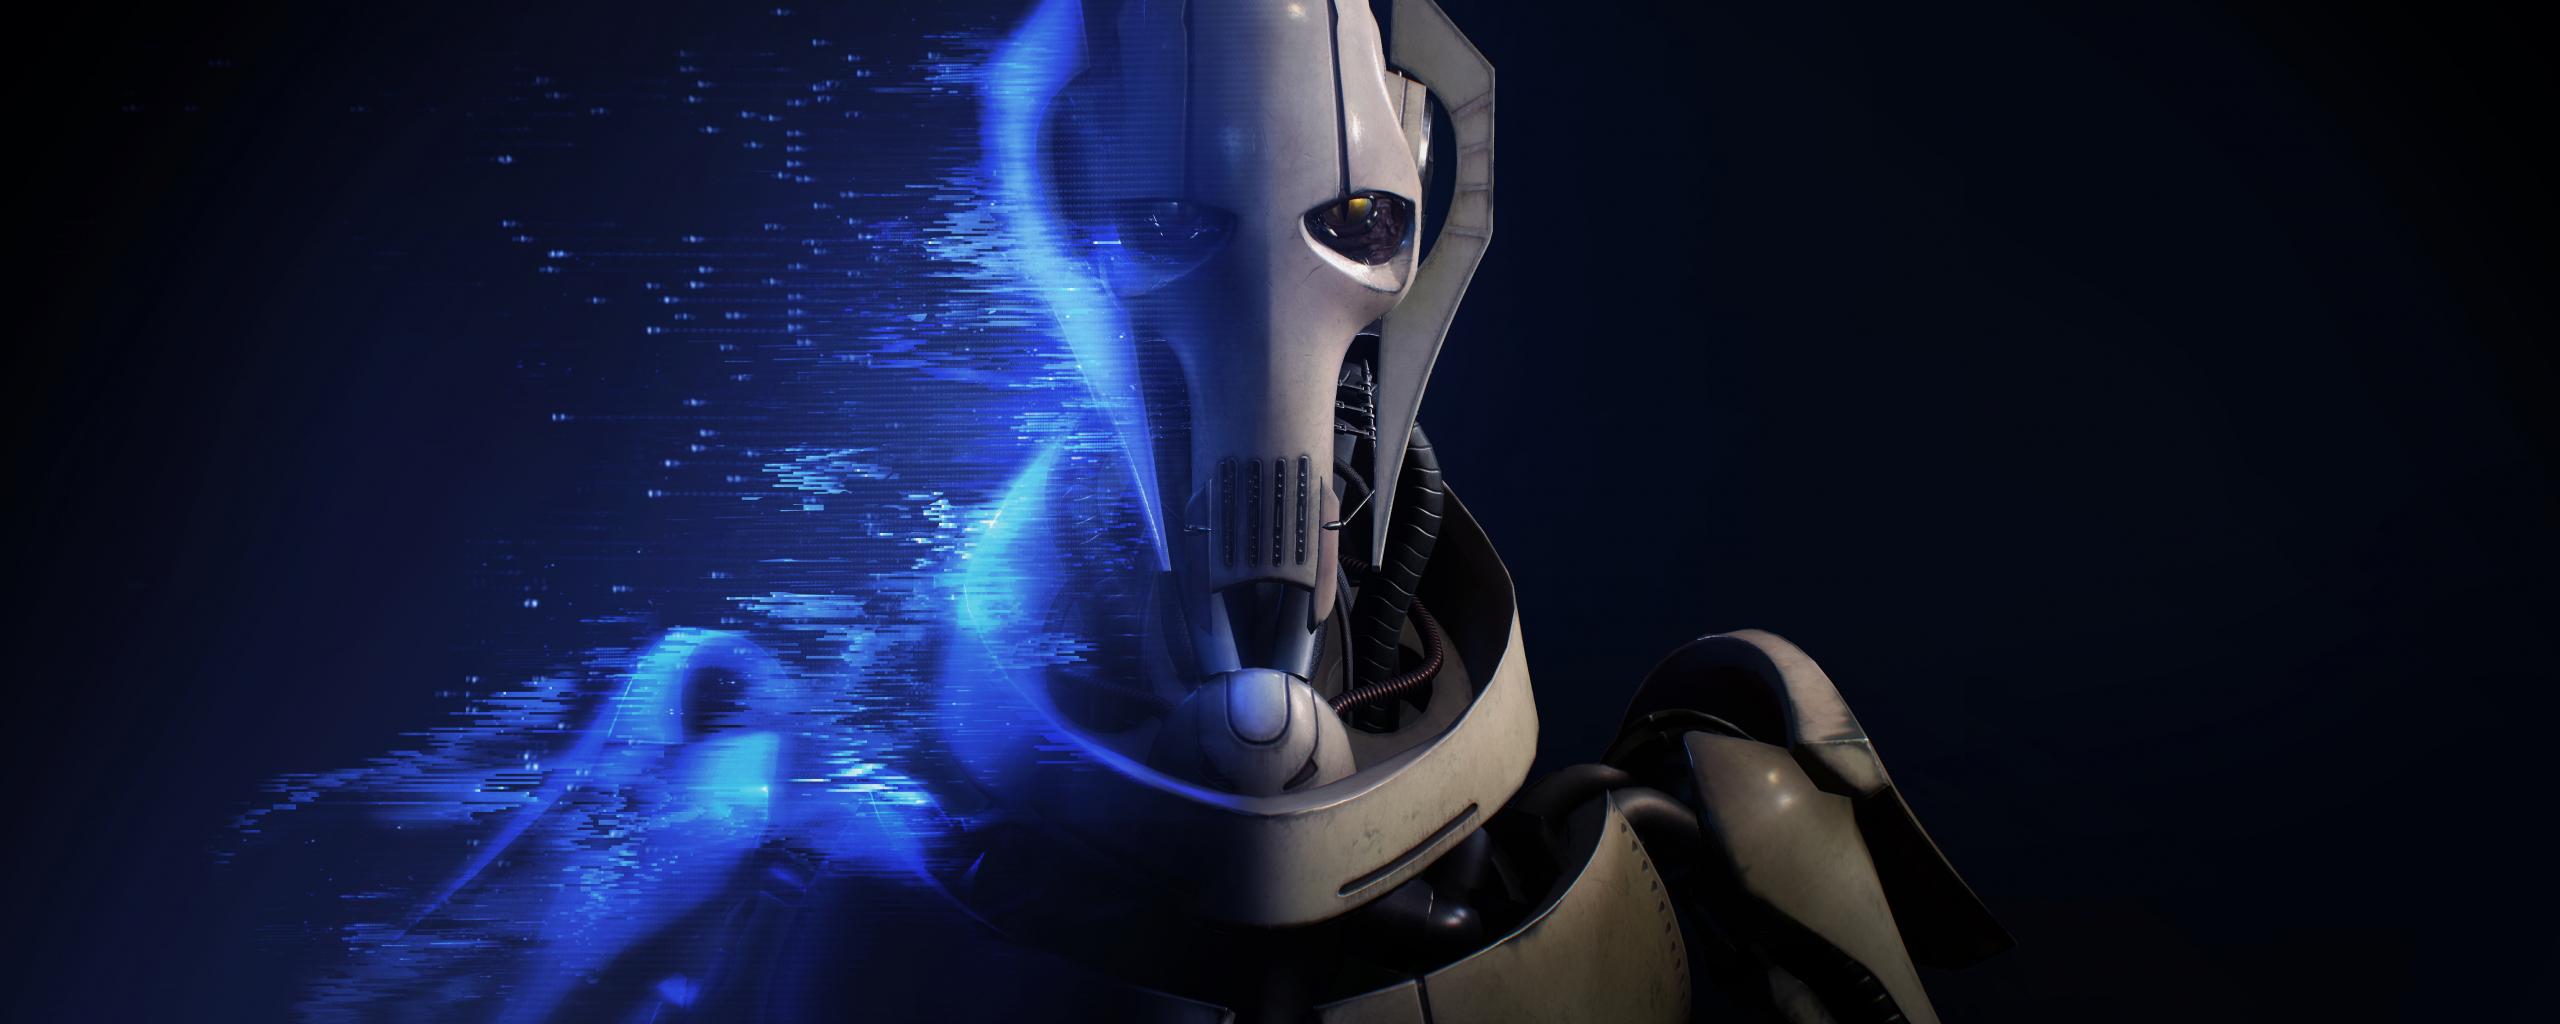 Download 2560x1024 Wallpaper Star Wars Battlefront Ii General Grievous Video Game Art Dual Wide Wide 21 9 Widescreen 2560x1024 Hd Image Background 10357